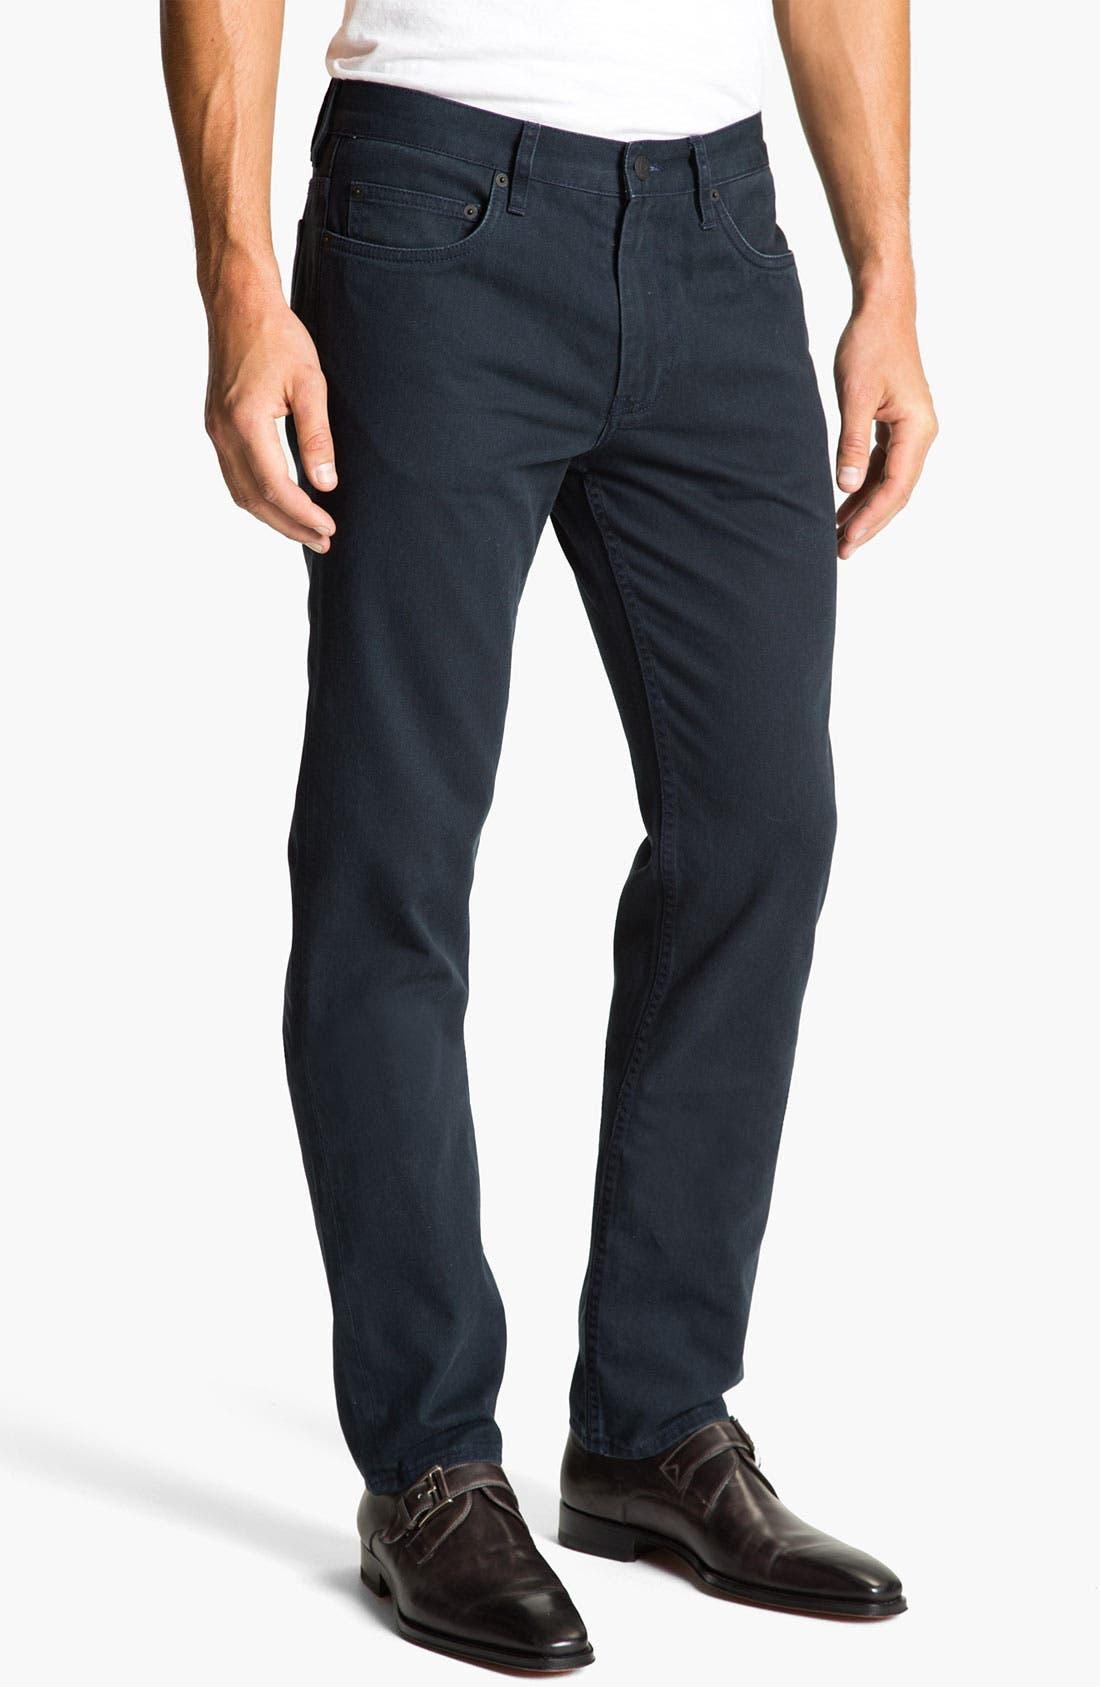 Alternate Image 2  - MARC BY MARC JACOBS Slim Straight Leg Jeans (Darkest Teal)